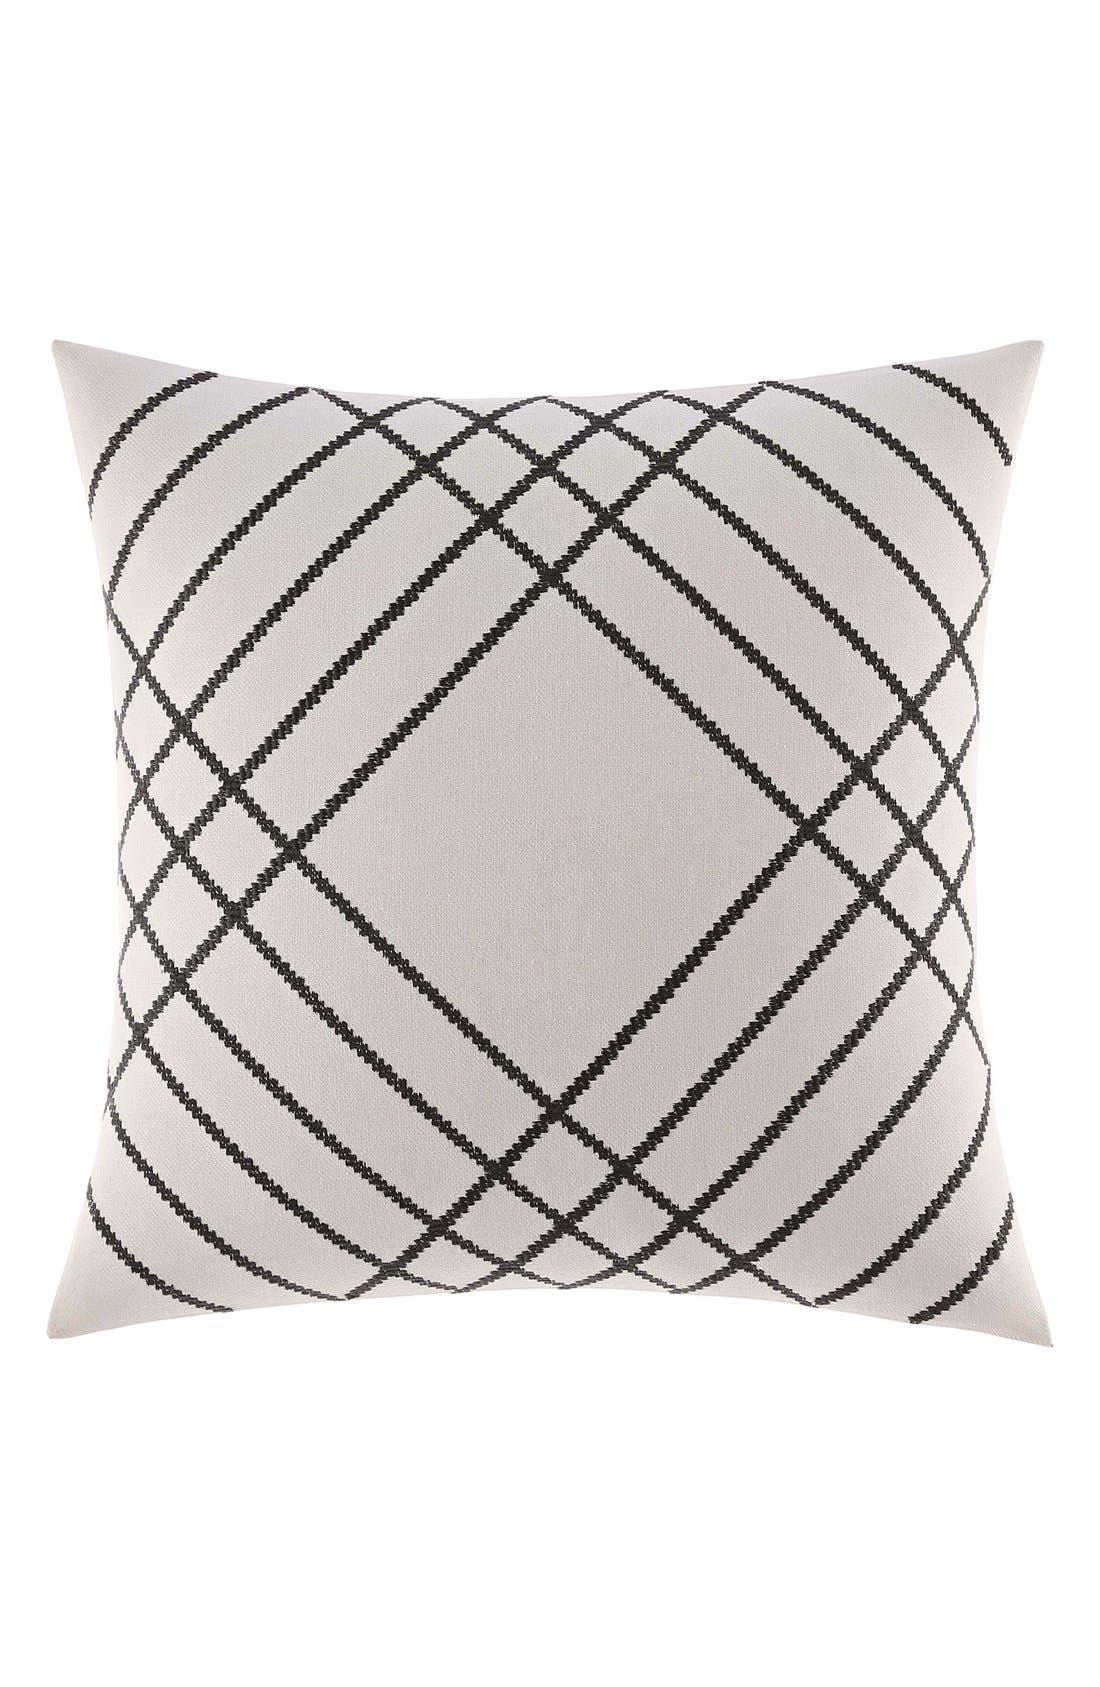 'Chatfield' Pillow,                         Main,                         color, 020